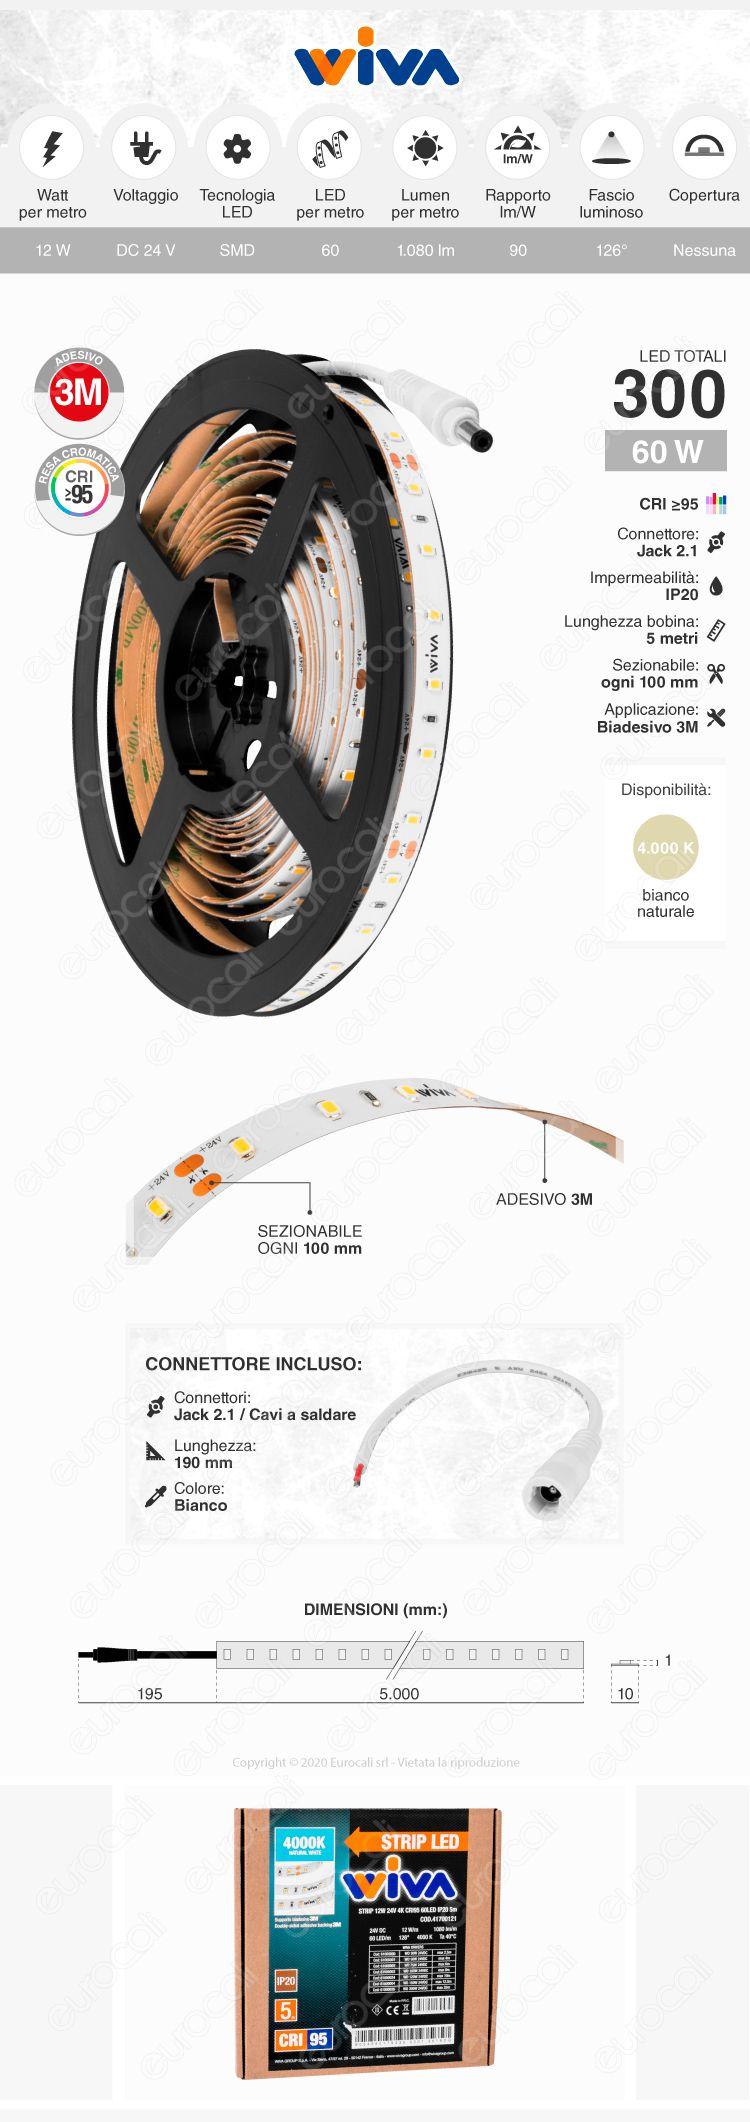 Wiva Striscia LED Monocolore 60 LED/metro CRI 95 - Bobina da 5 metri